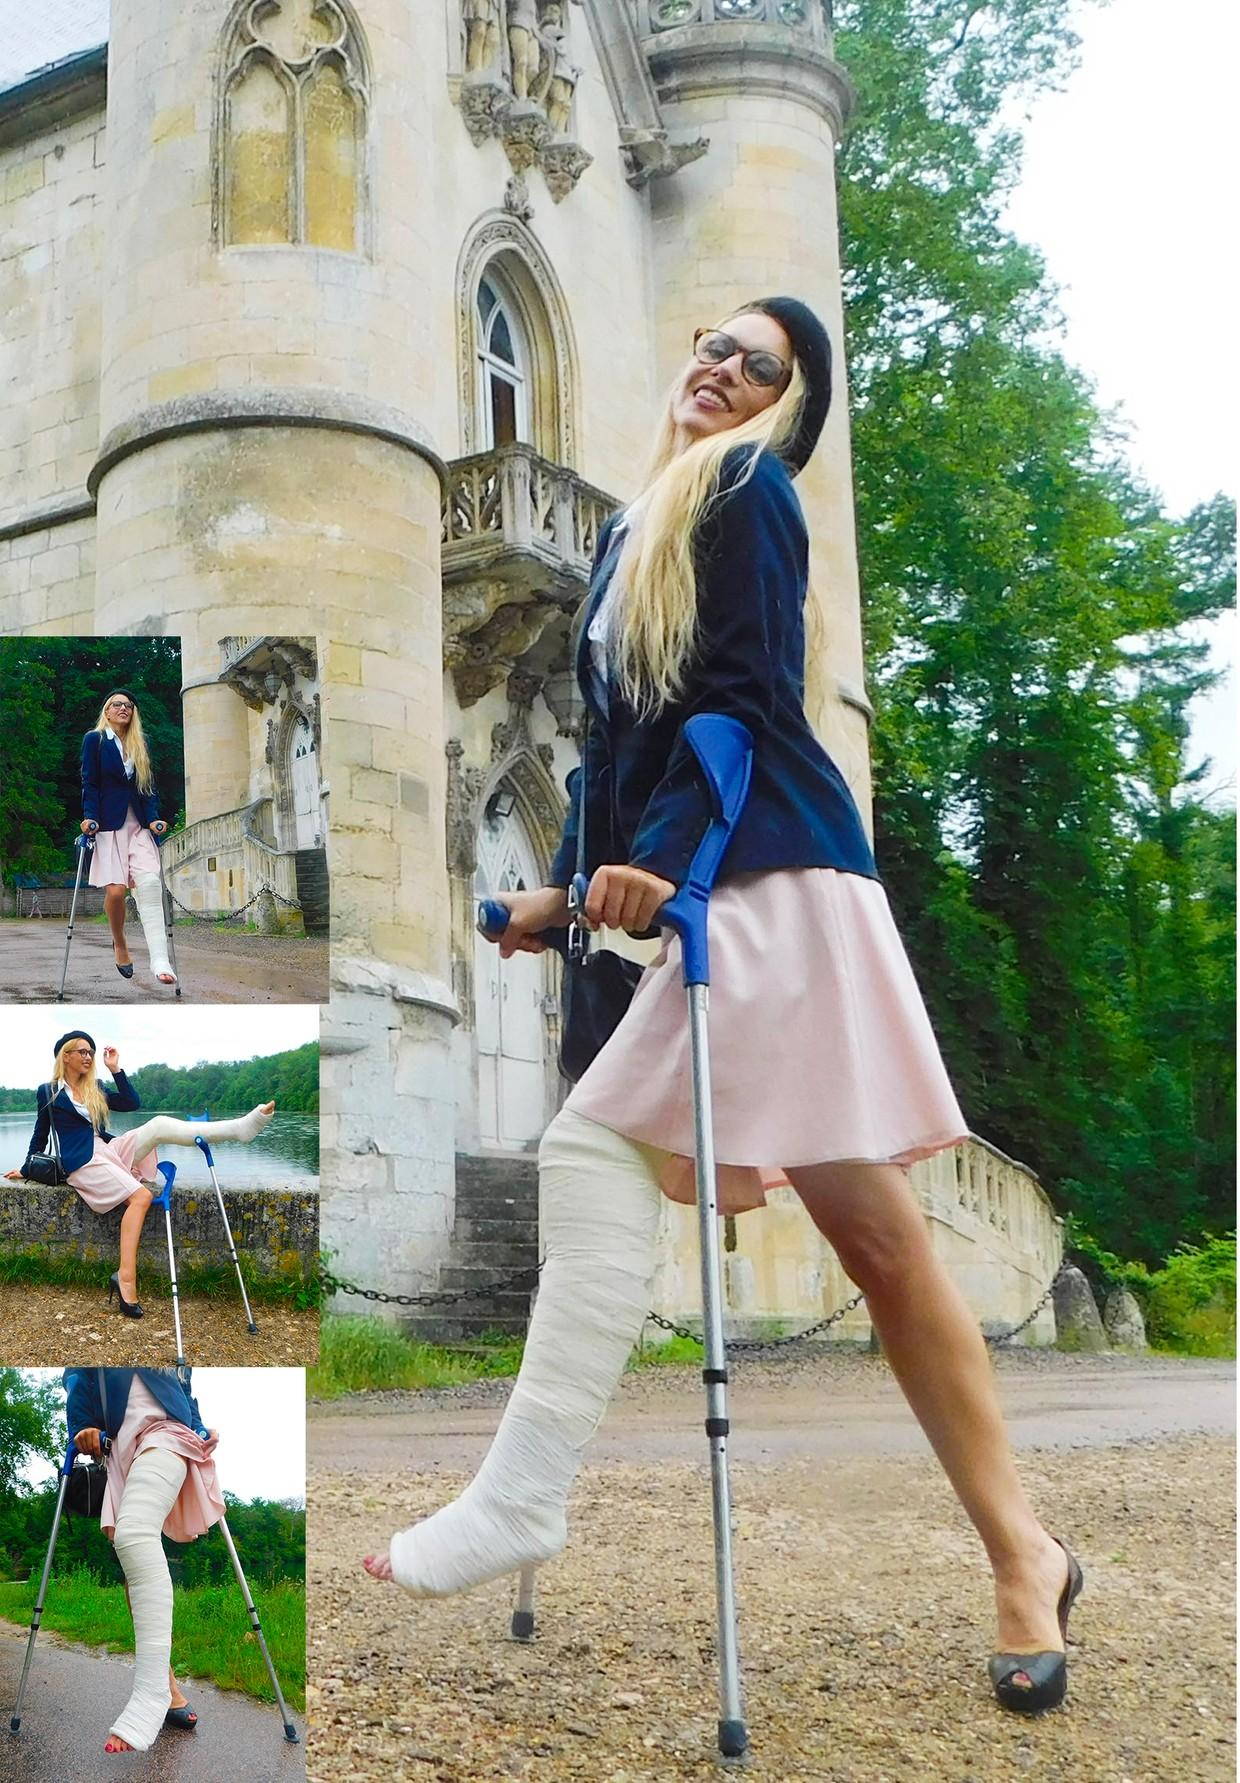 Castlinda LLC - Jolie Modling - Linda crutching around - with a plaster LLC on her left leg.